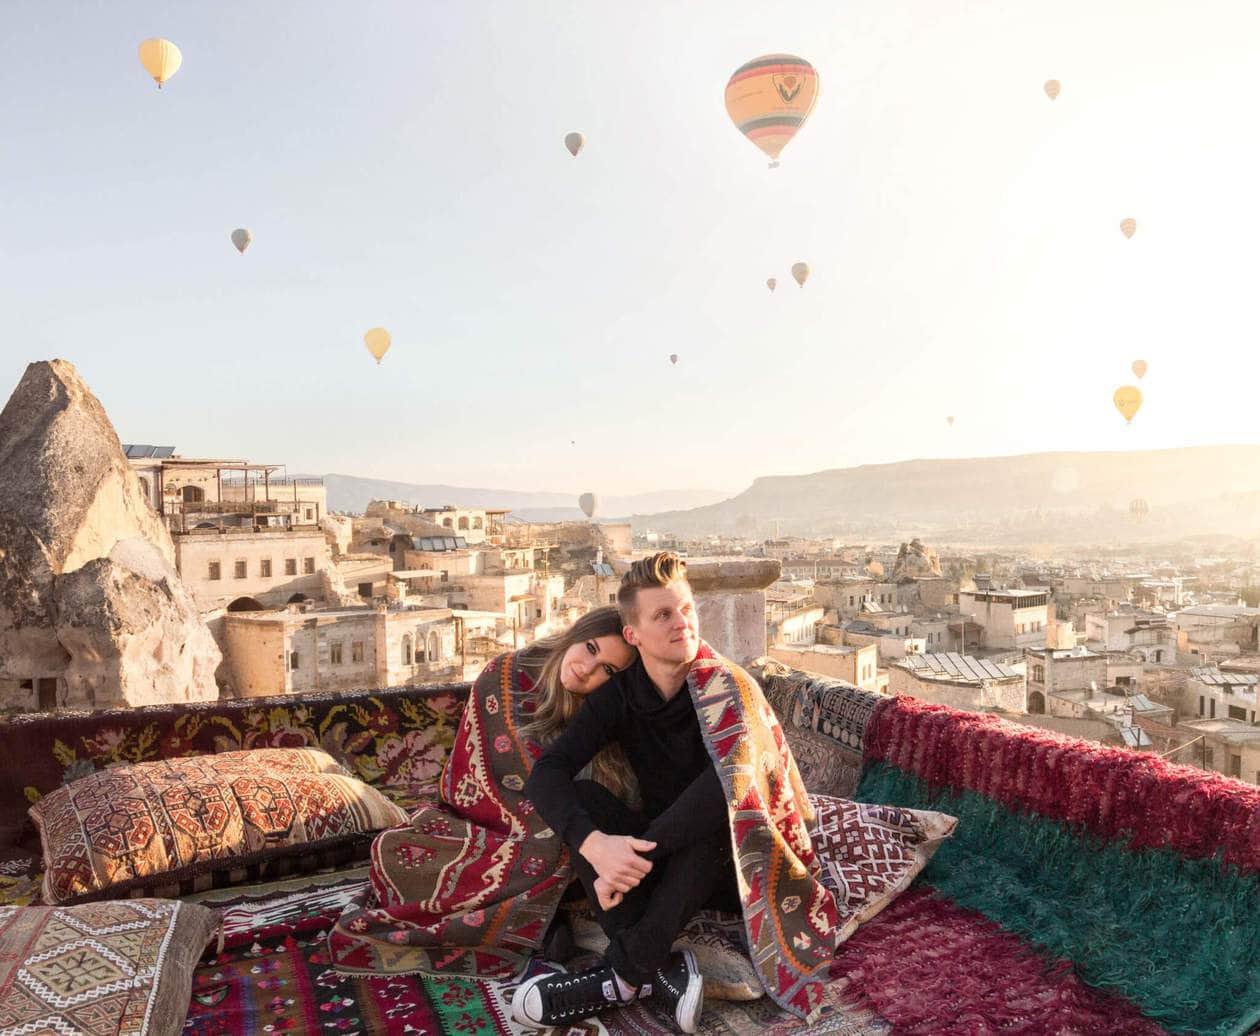 Cappadocia Hot Air Balloons at Sunrise